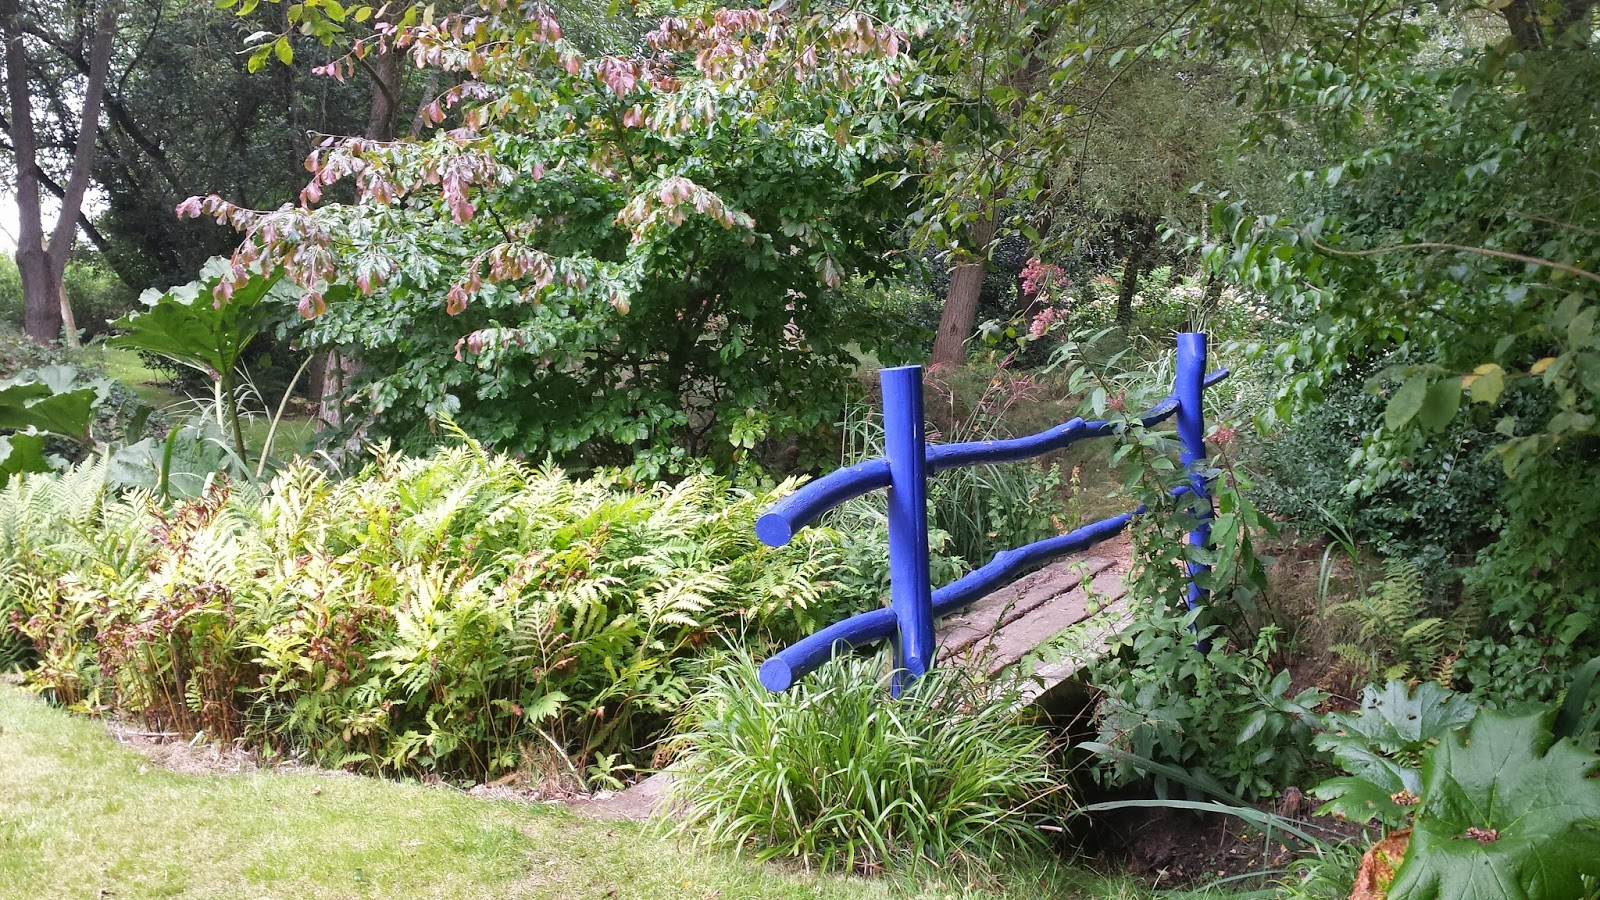 Job de r ve le jardin du pellinec - Jardin du pellinec ...